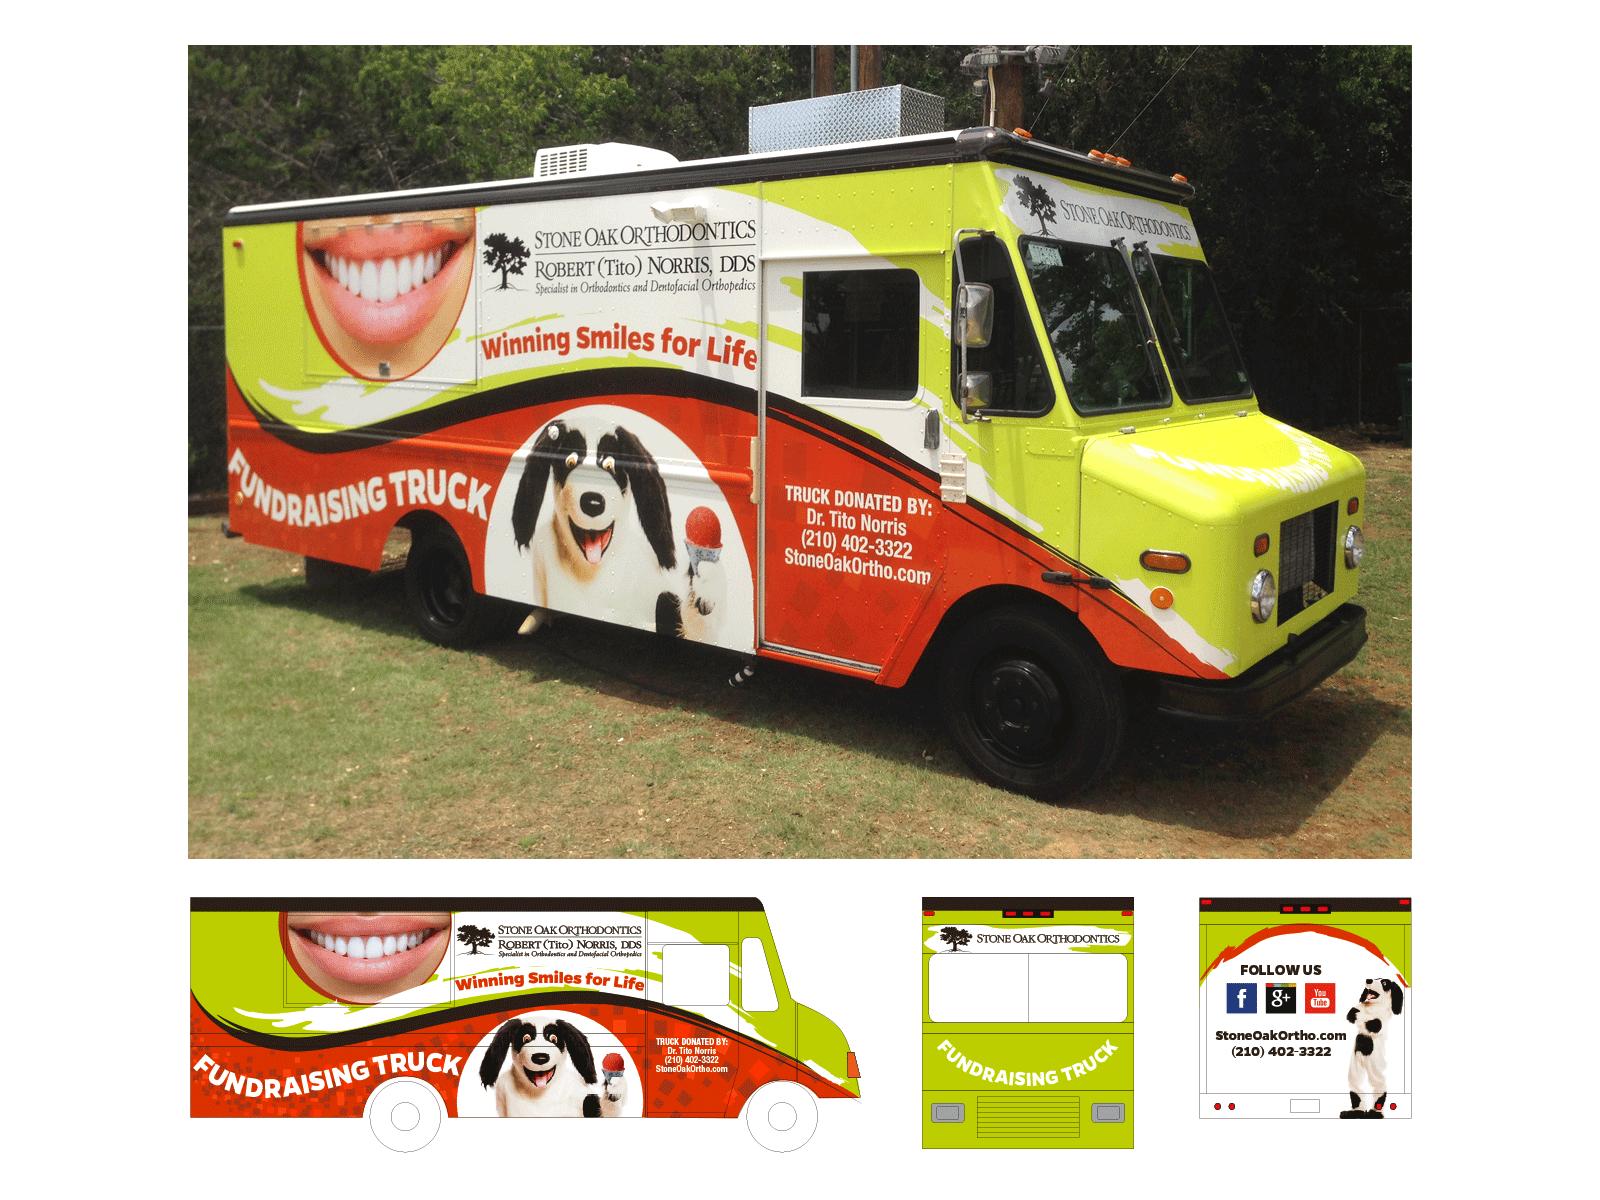 Stone Oak Orthodontics : Truck Wrap